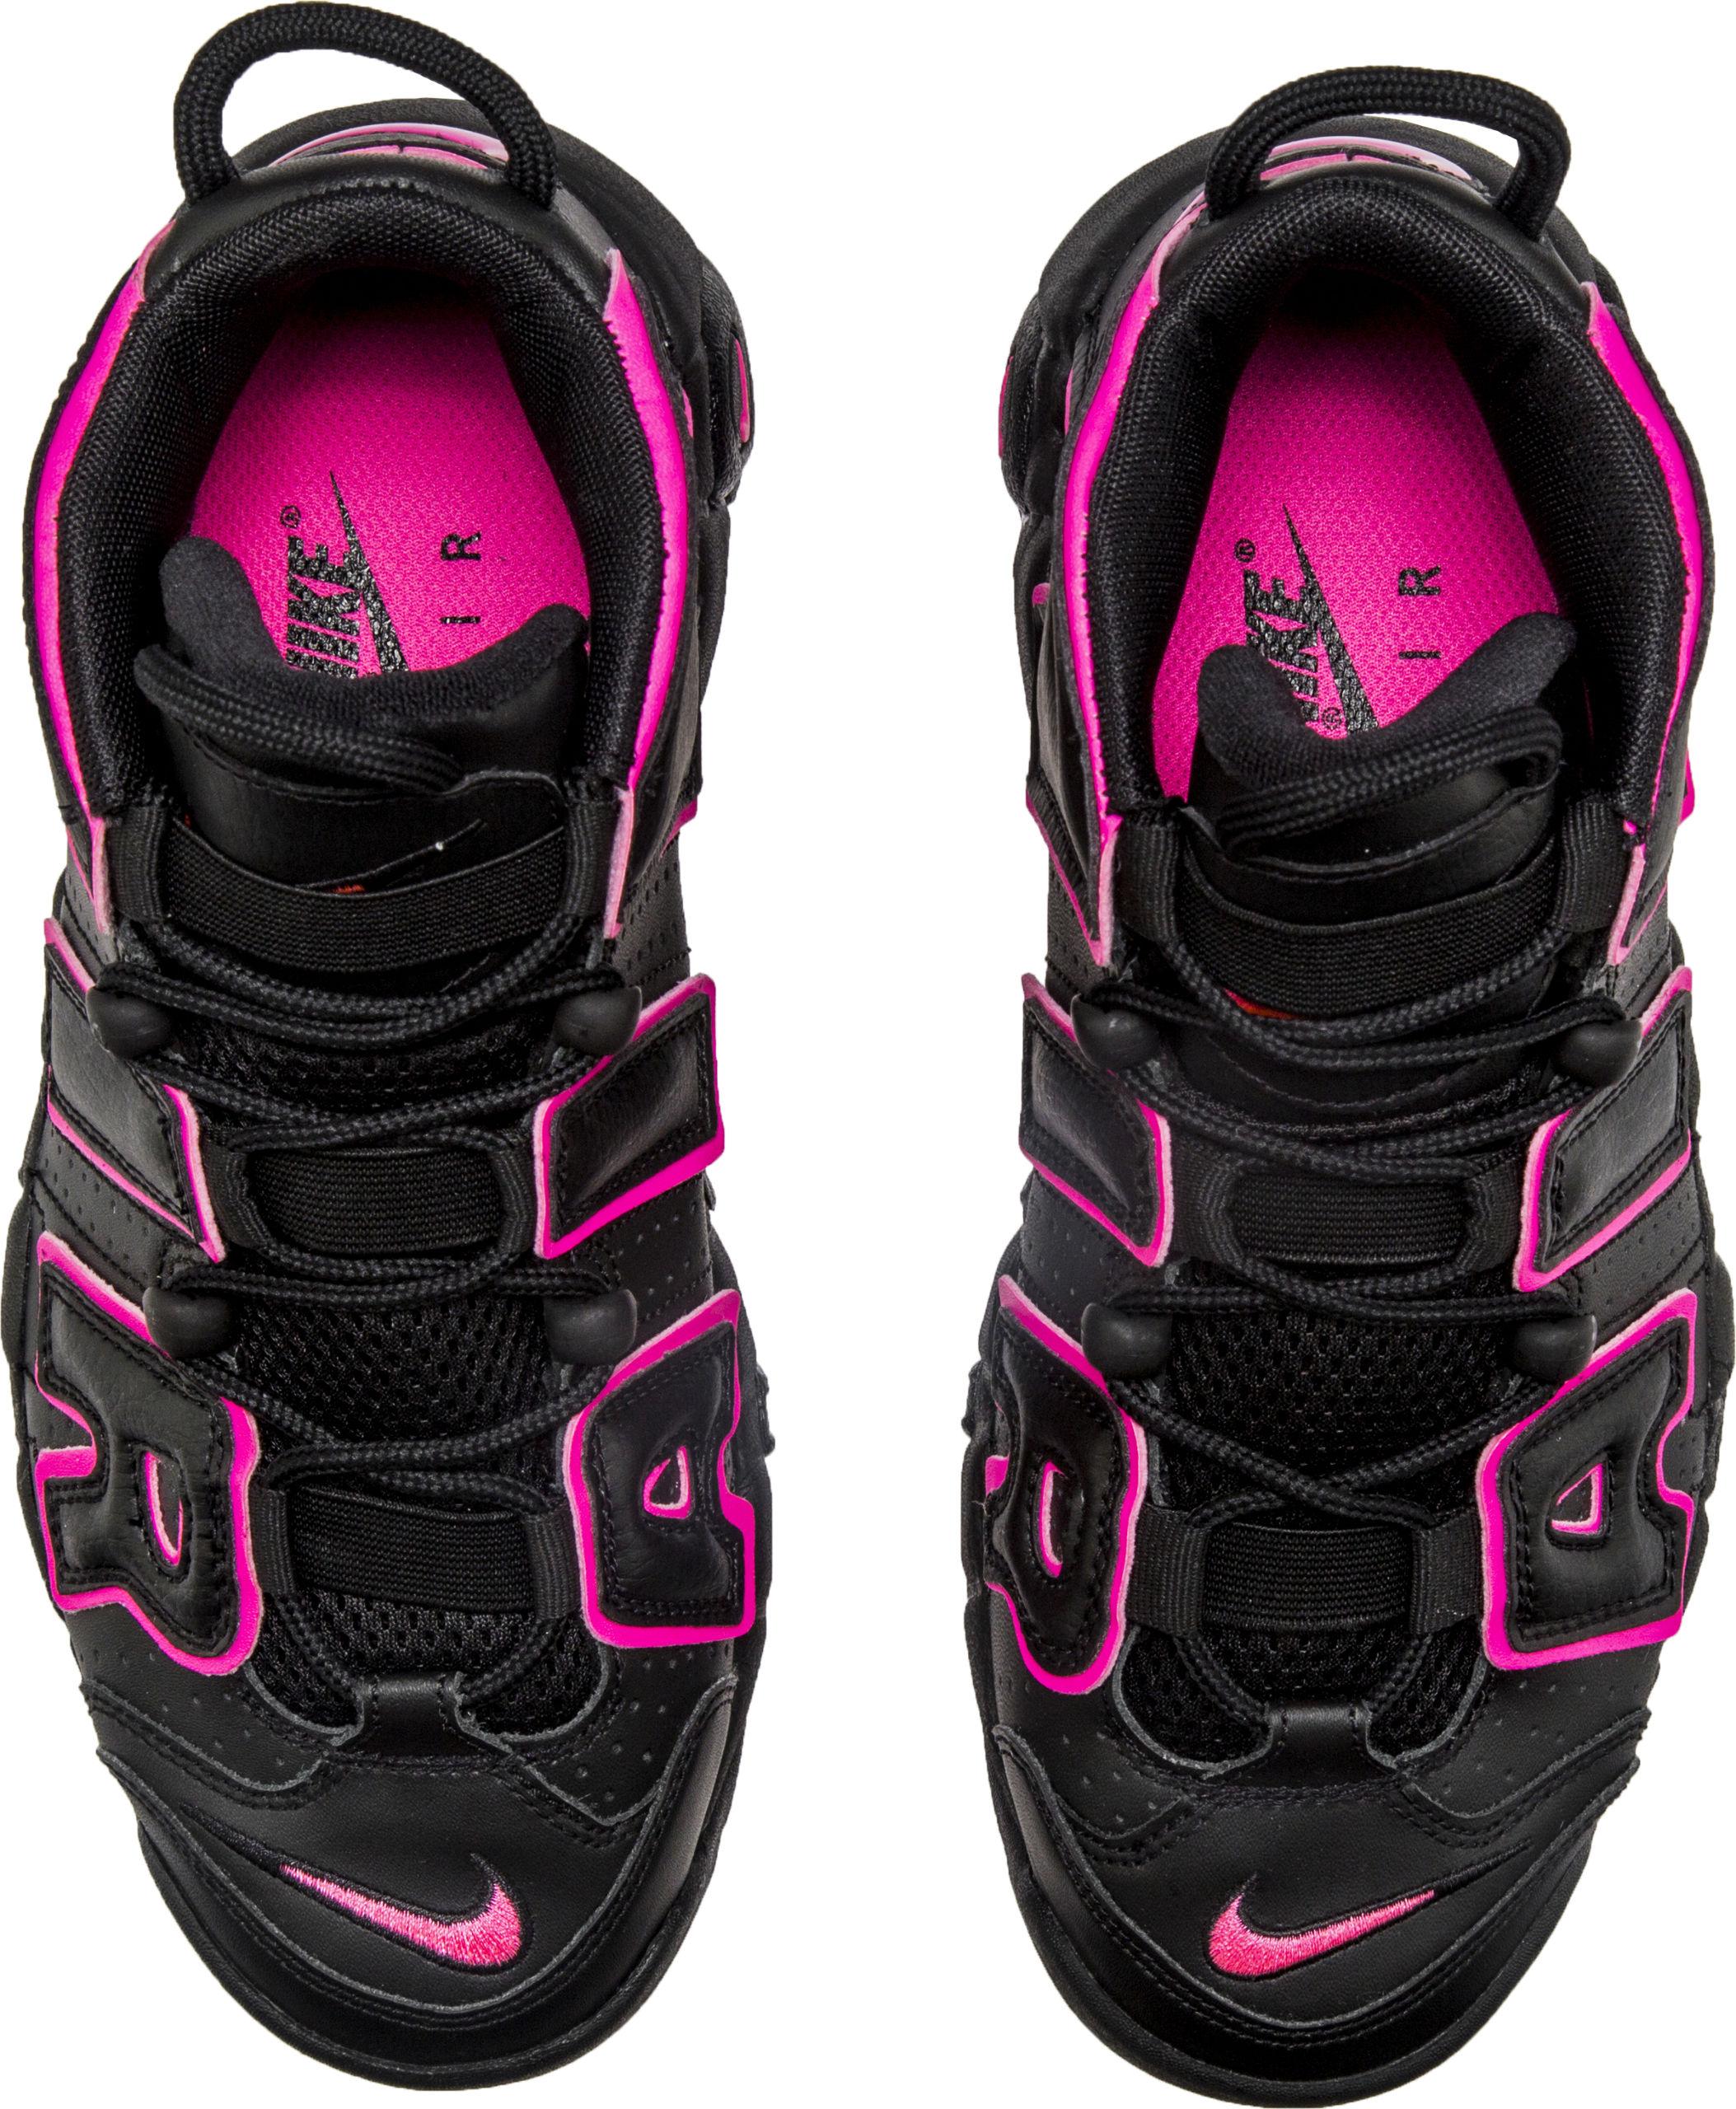 b9d38ee80eb2d Nike Air More Uptempo GS Black Pink 415082 003 4 – Housakicks